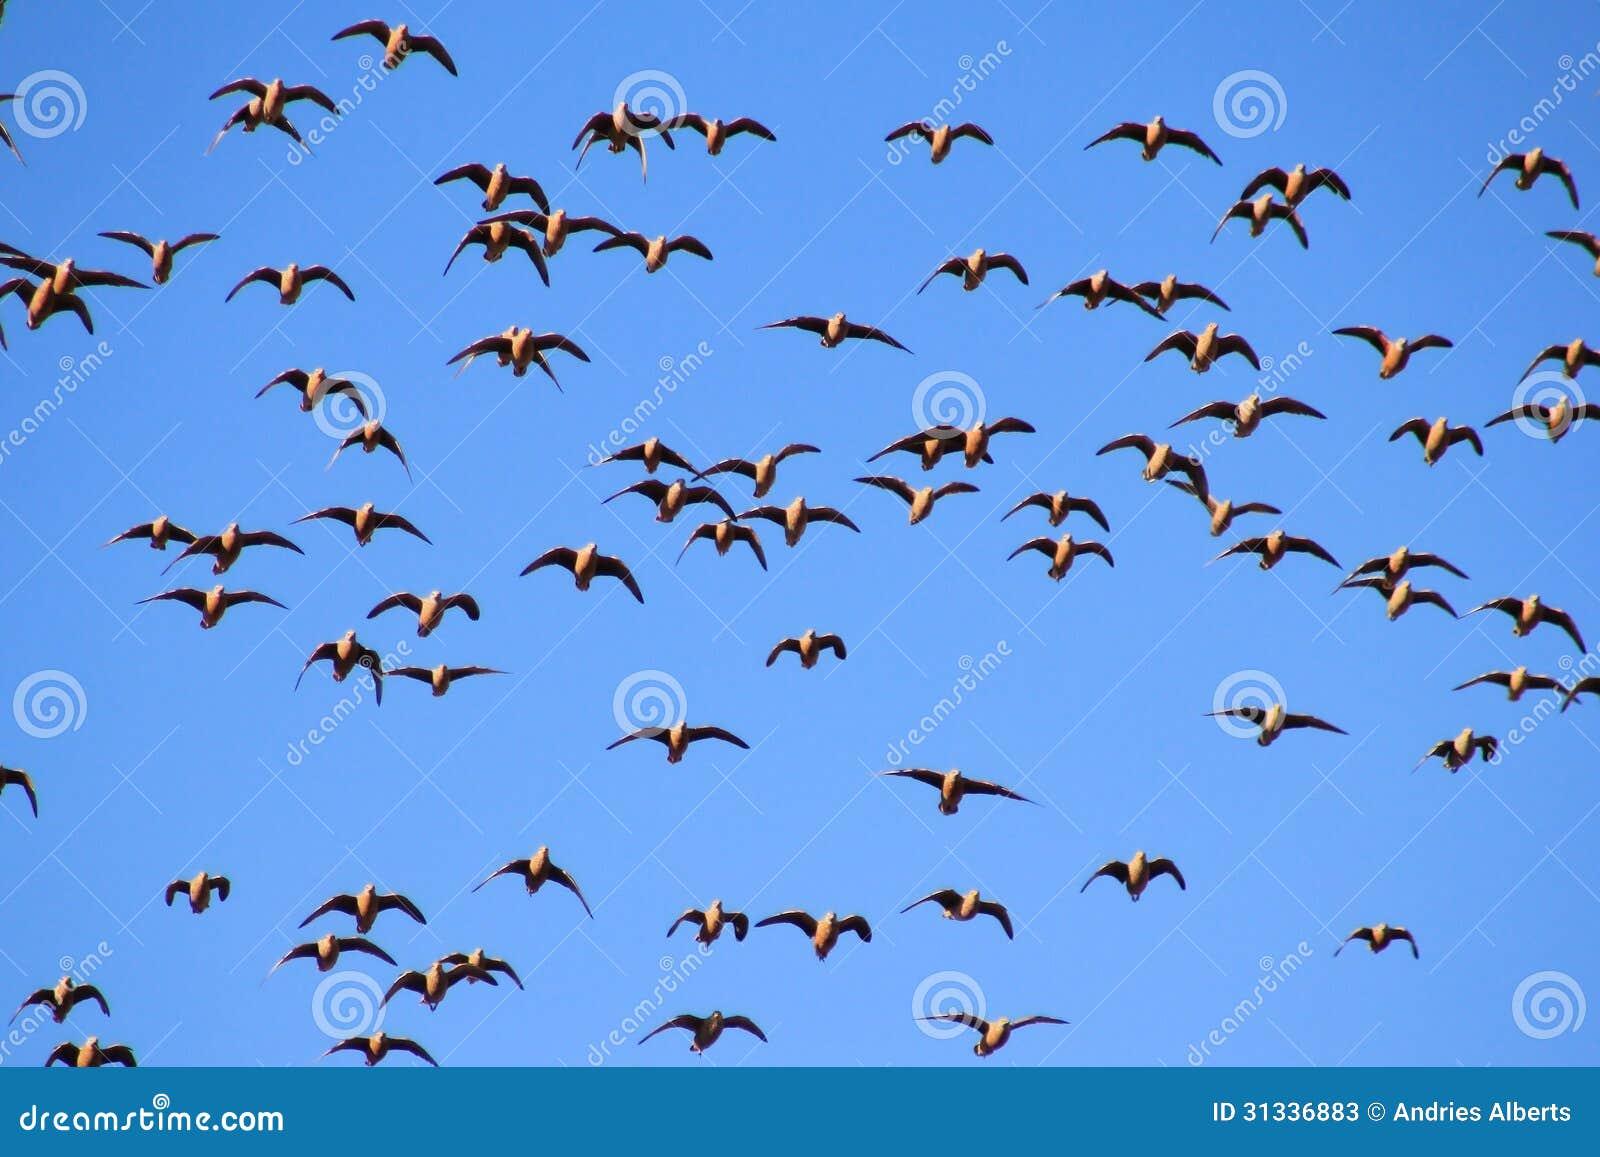 Sandgrouse, Namaqua - Wild Birds From Africa - In Flight